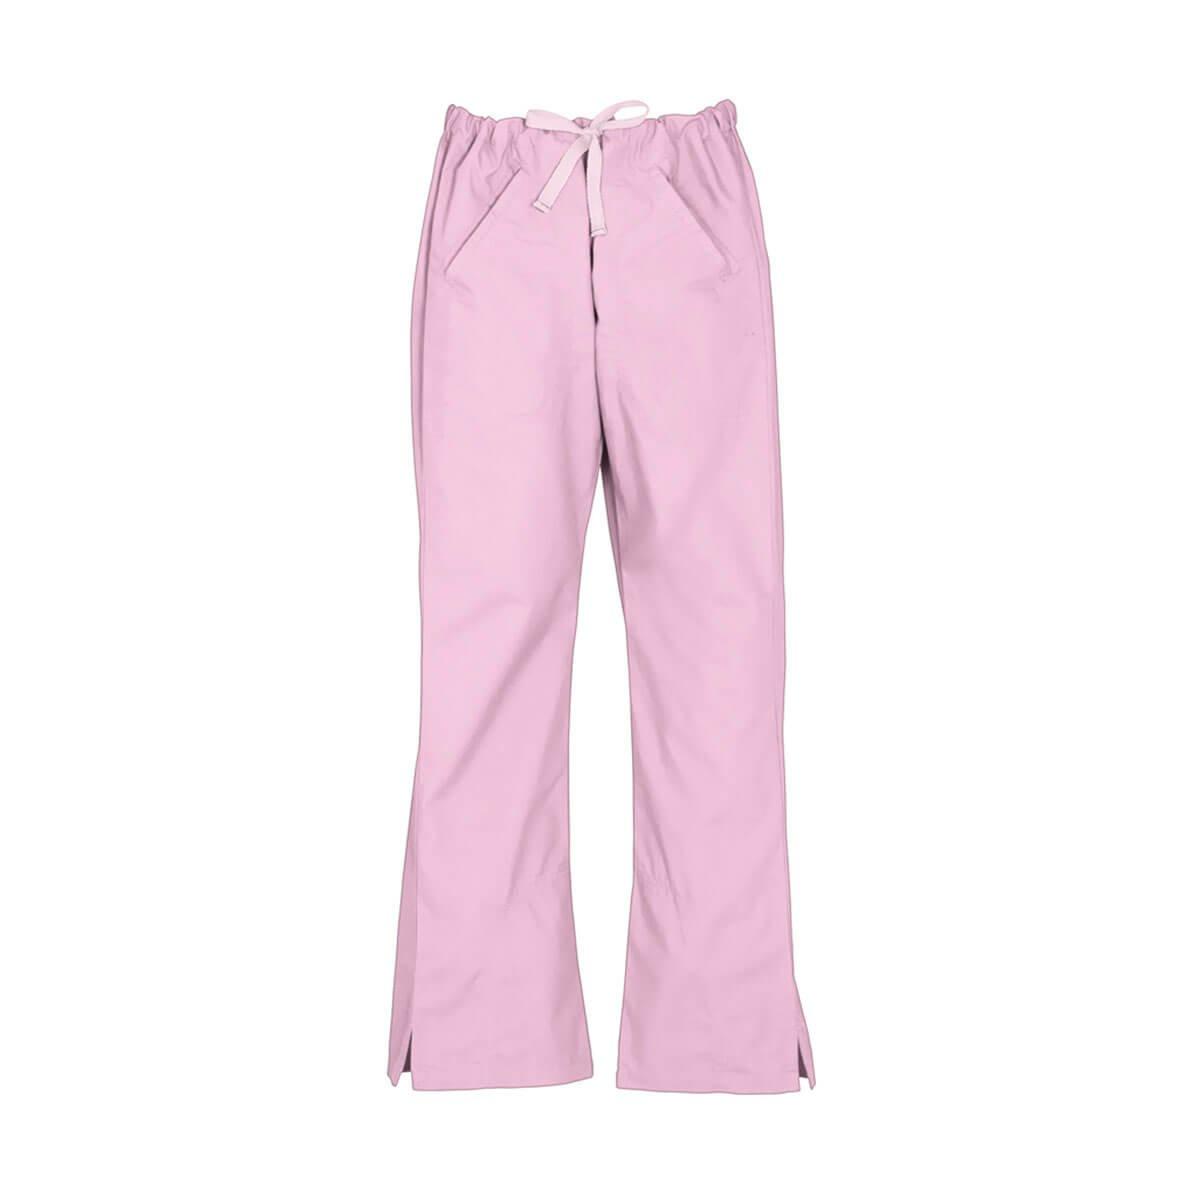 Ladies Classic Scrubs Bootleg Pant-Baby Pink